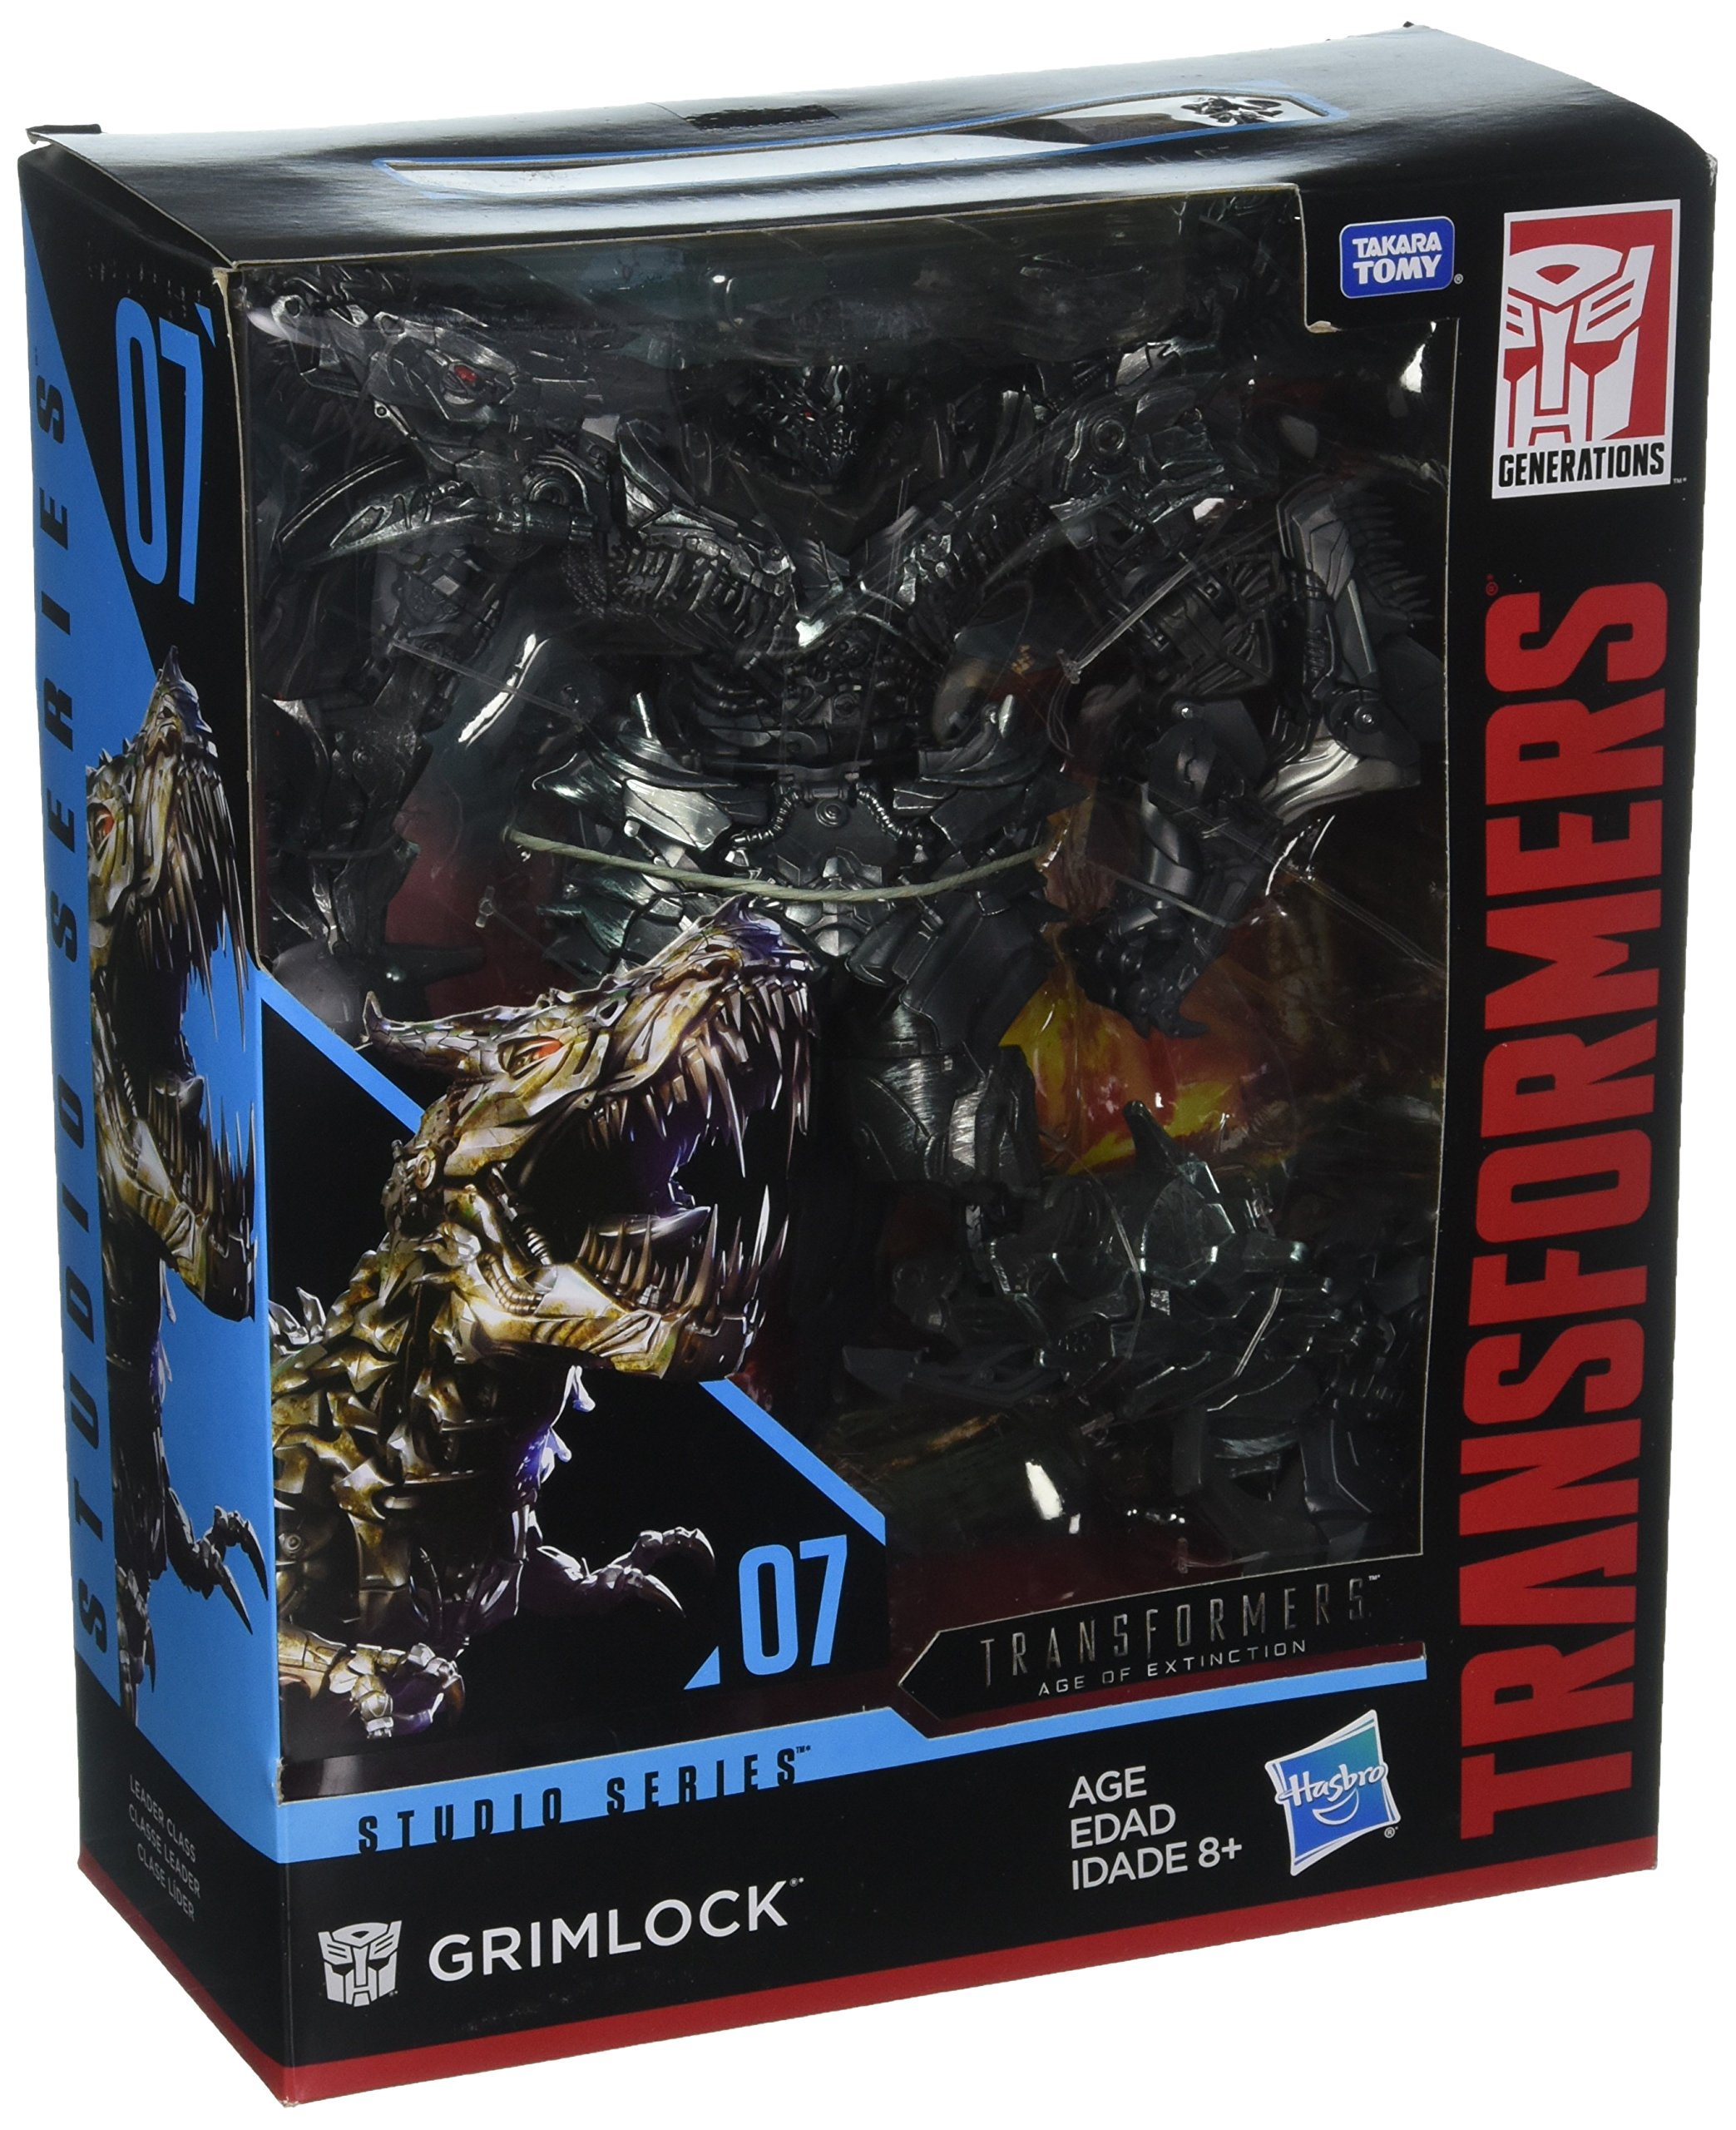 Transformers Studio Series 07 Leader Class Movie 4 Grimlock by Transformers (Image #1)